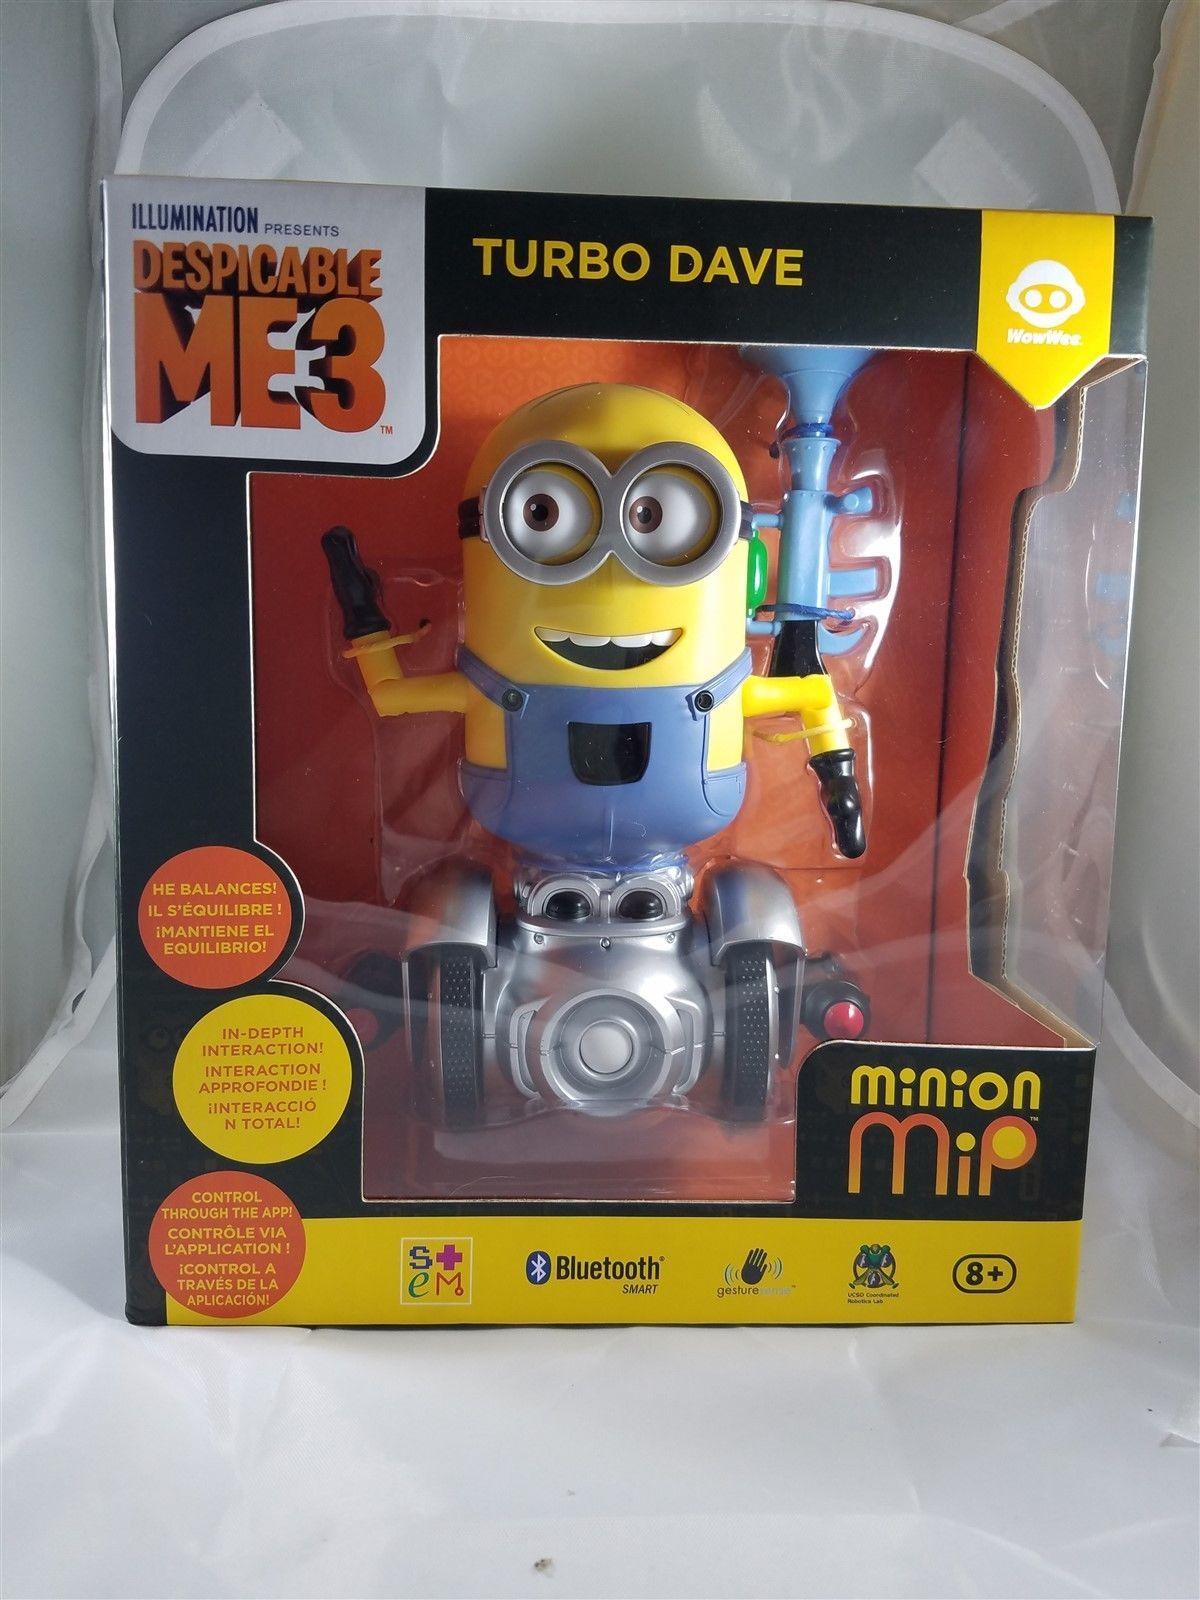 Mip Toy Nip Wowwee Dave Turbo Mini Minion Robot 0kP8nwONX